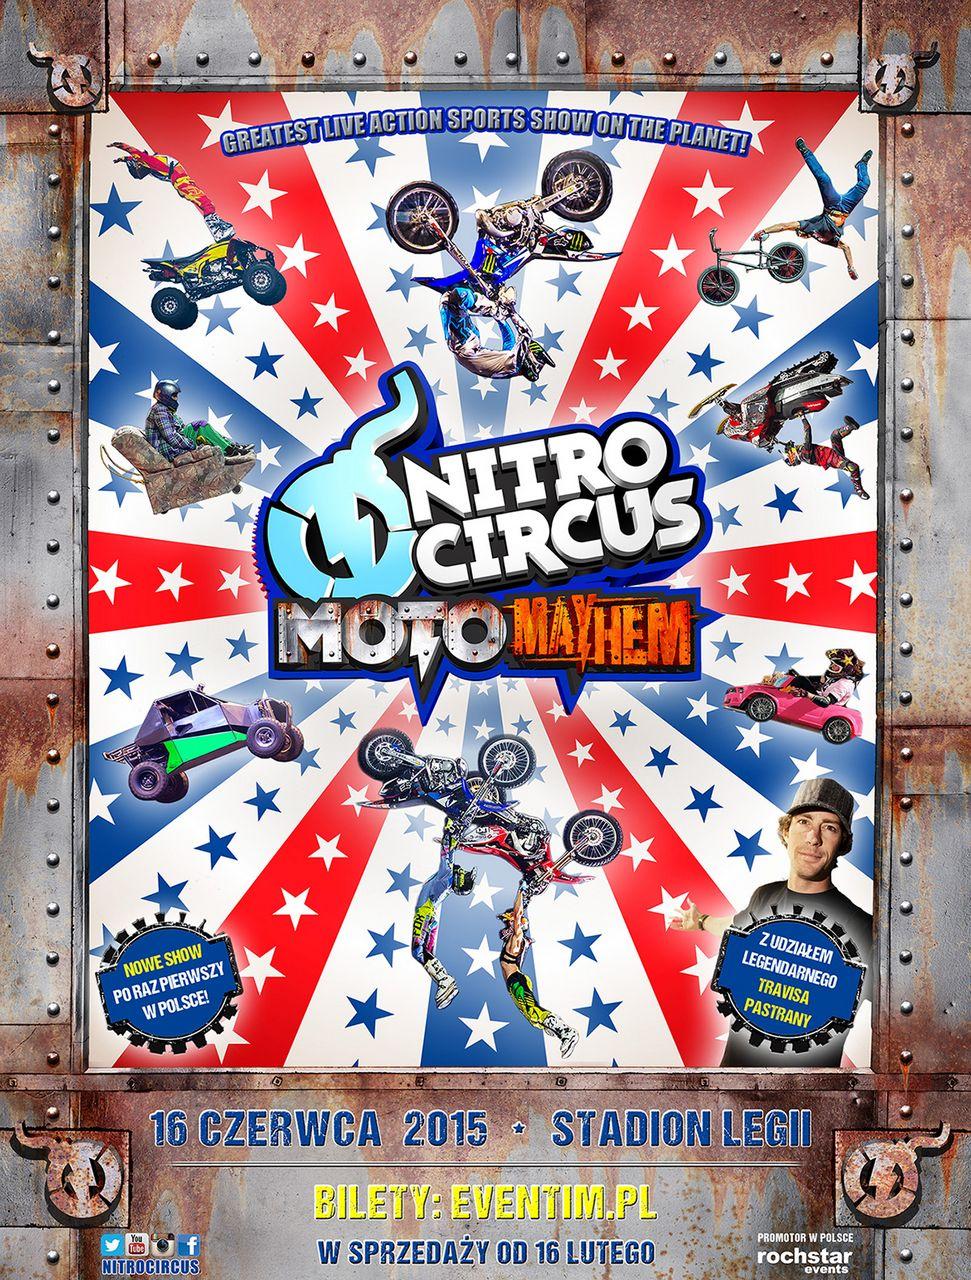 Nitro Circus Live Travisa Pastrany ponownie w Polsce!